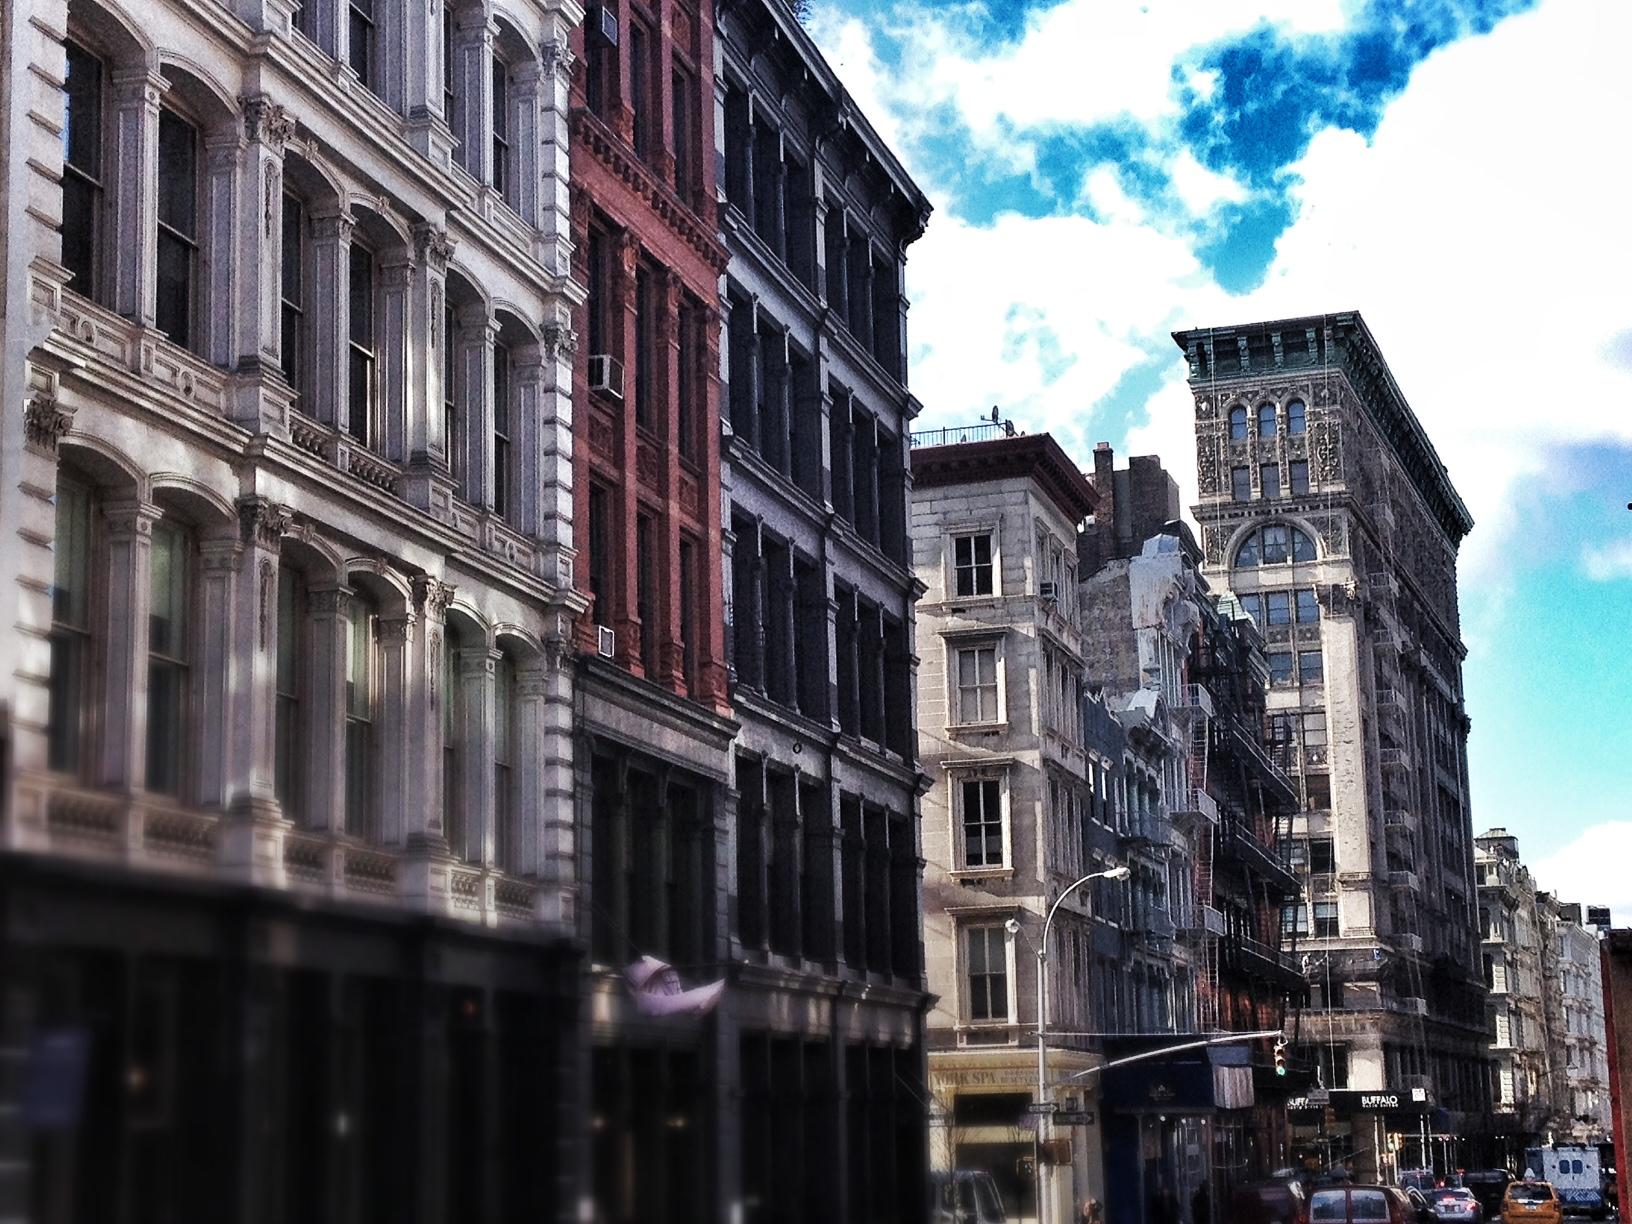 Broome Street, Soho, 487 Broadway